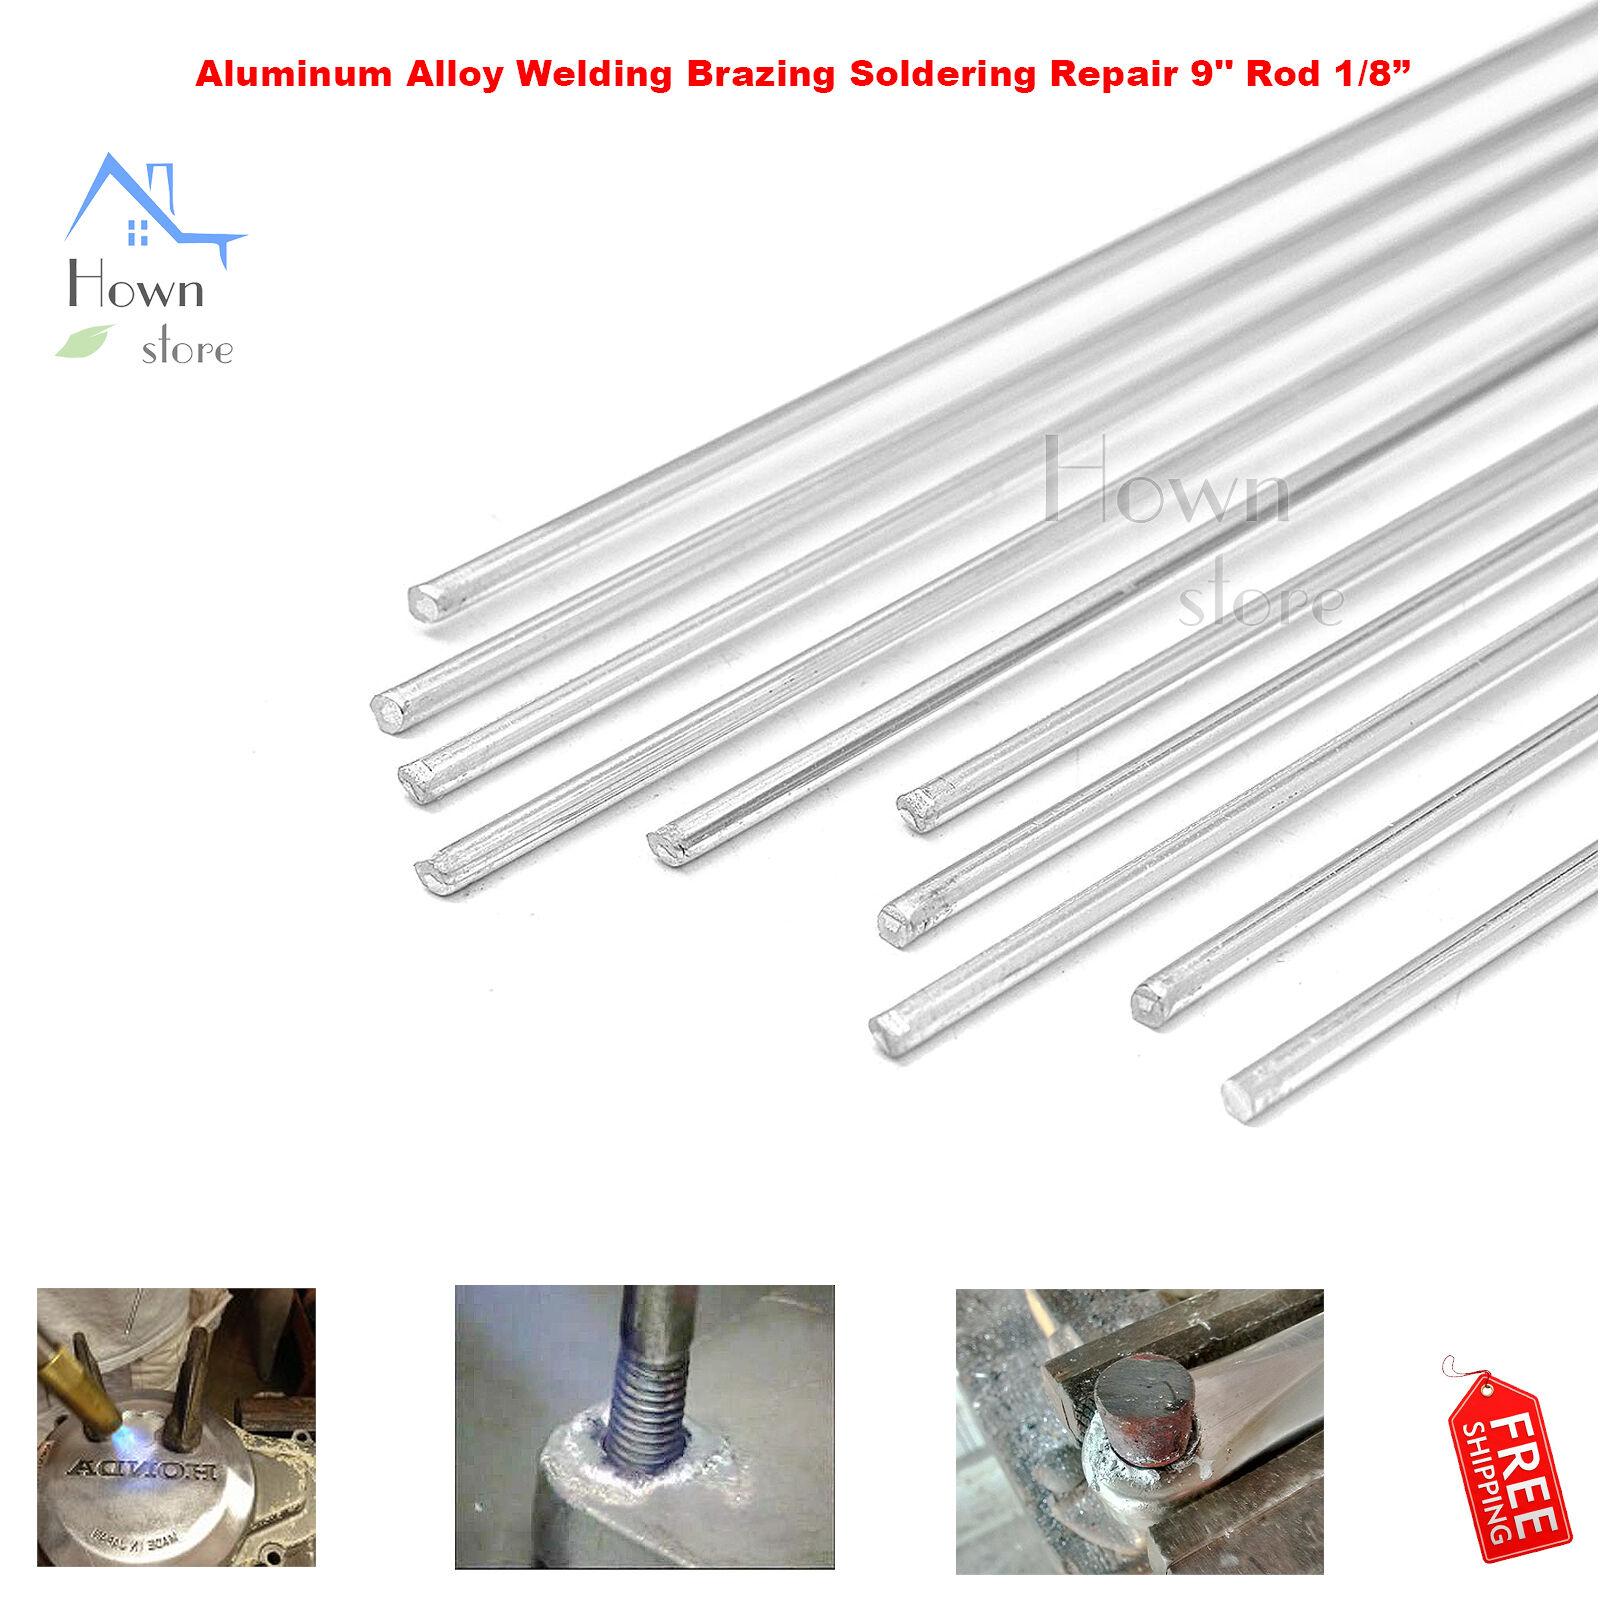 Alloy Aluminum Welding Brazing Soldering Repair 9\